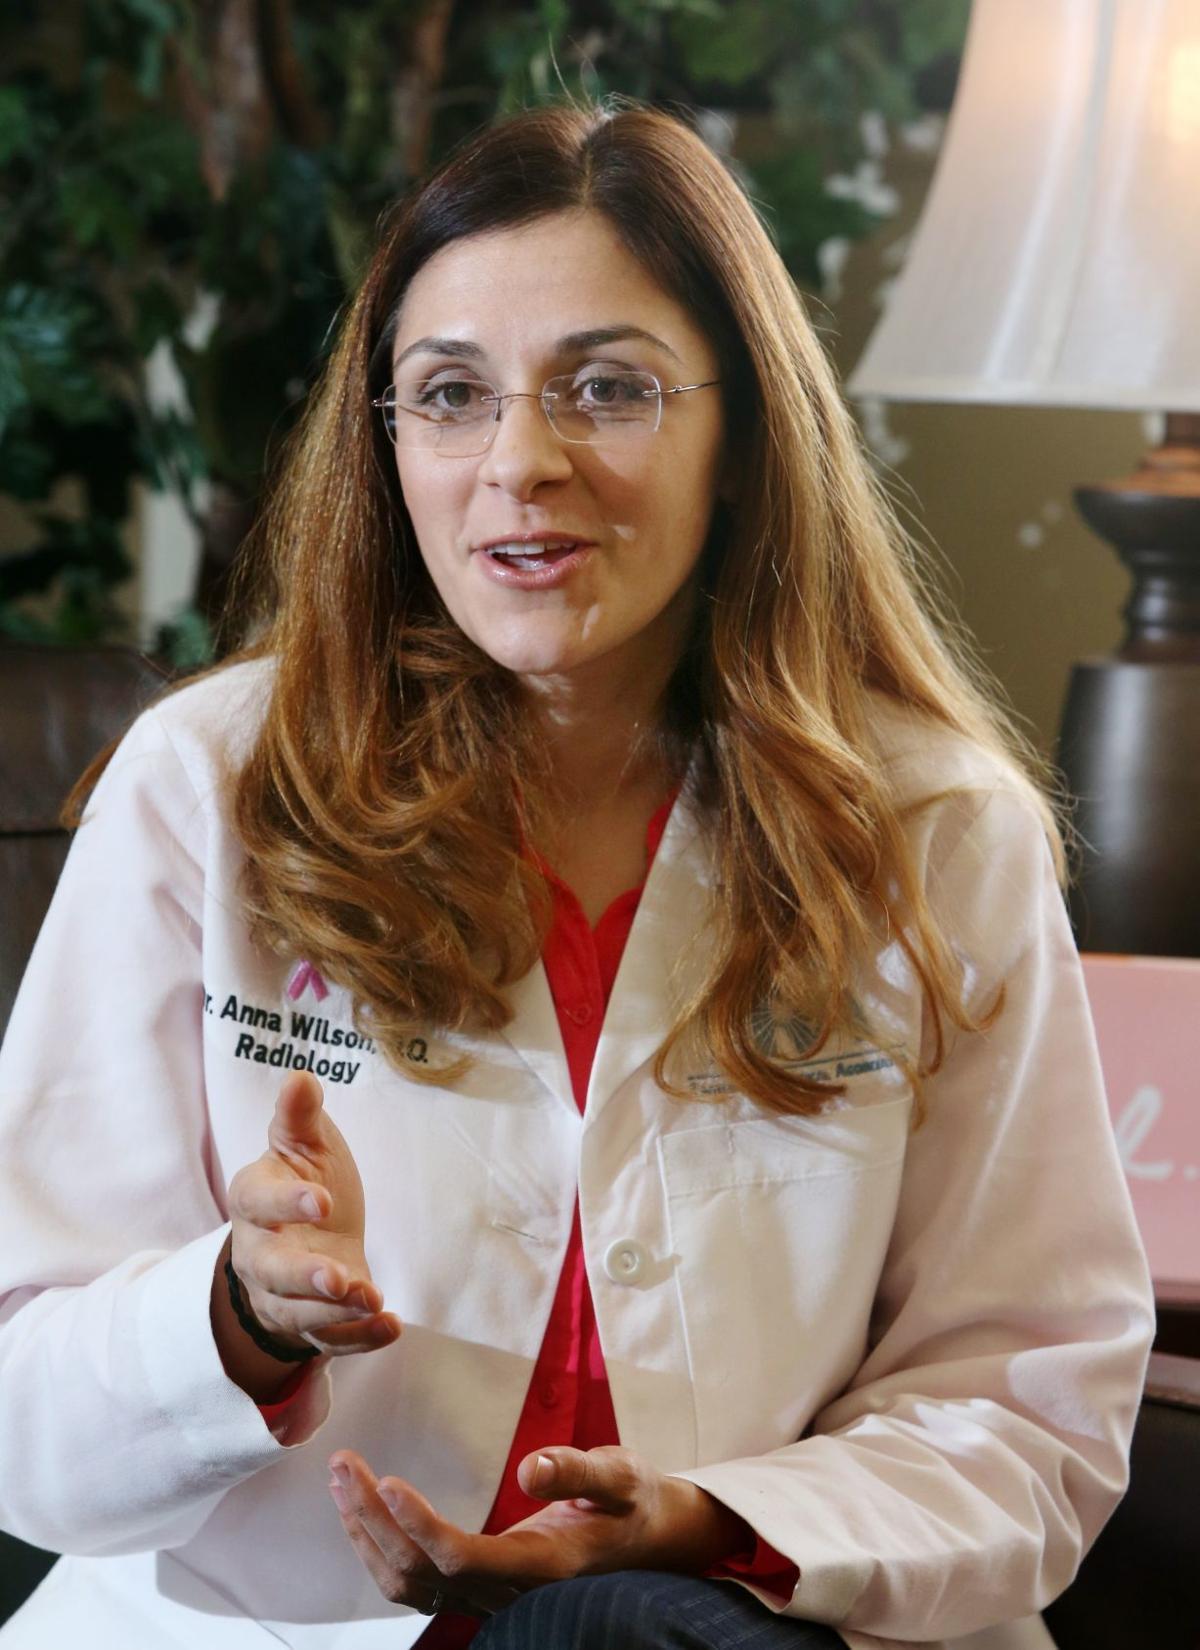 Dr. Anna Wilson